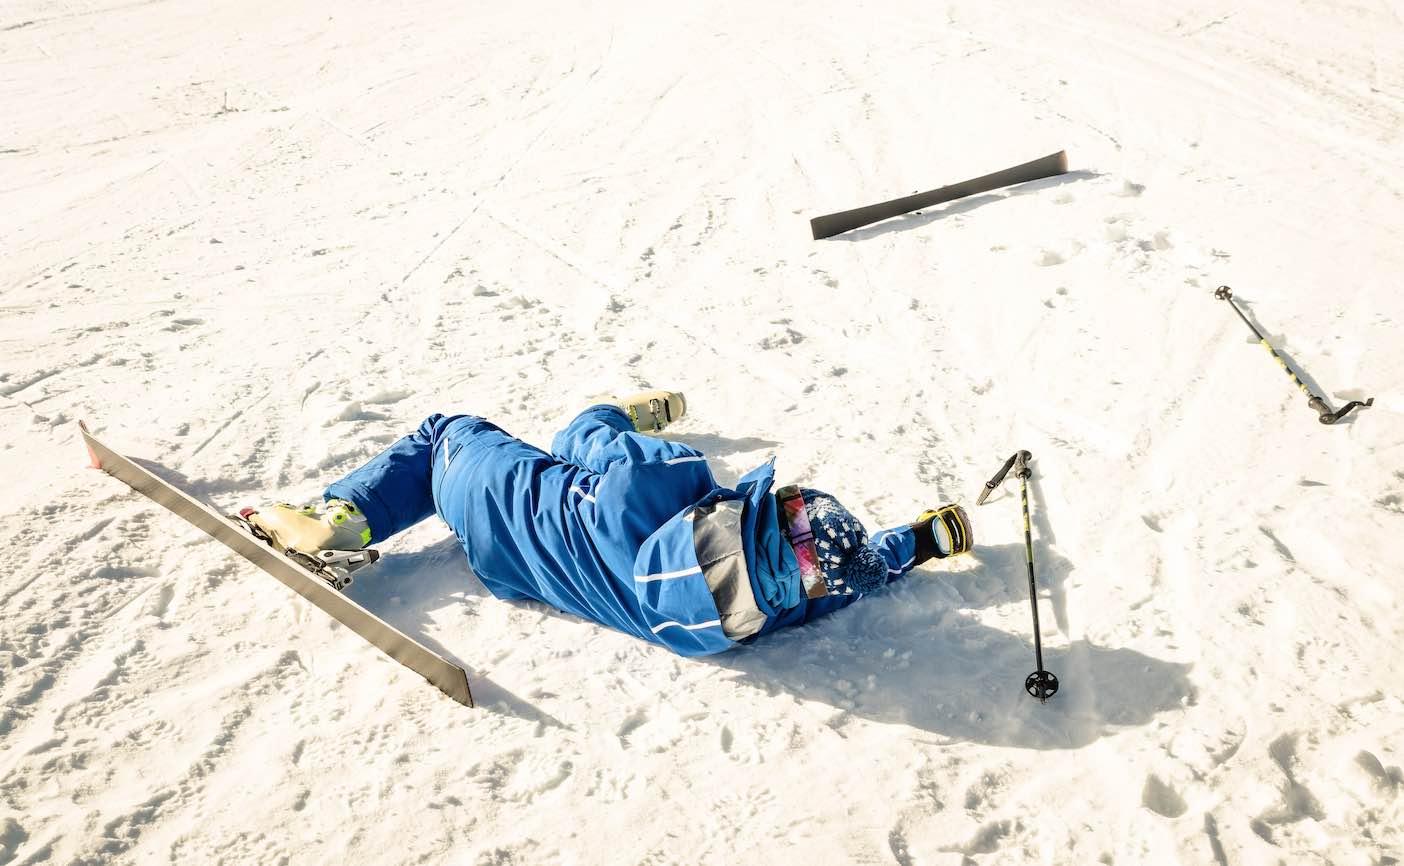 esqui snowboard caida lesion